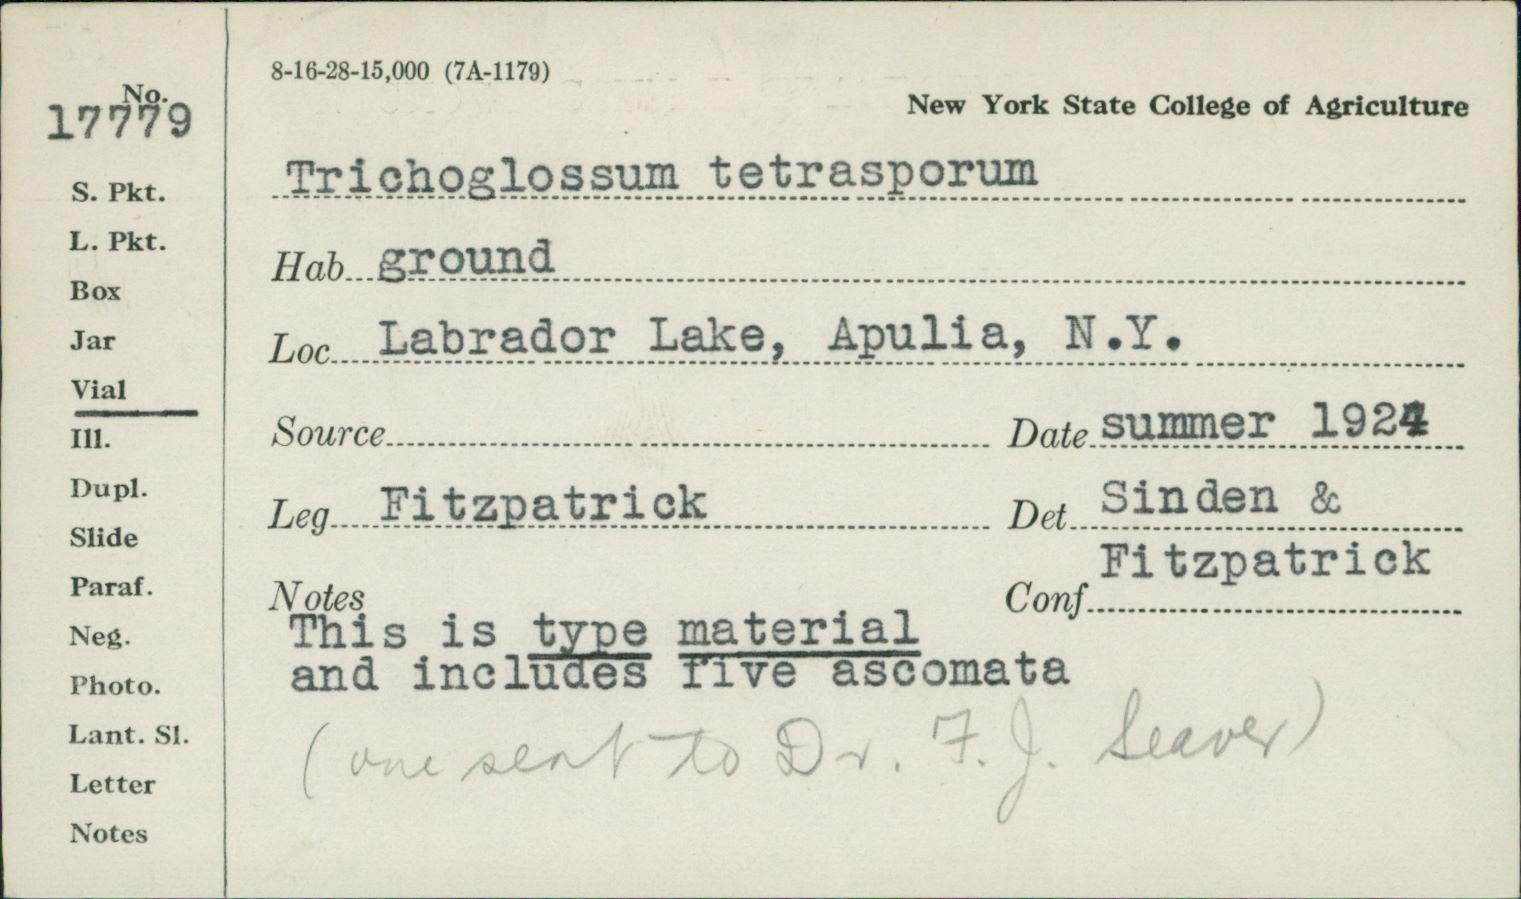 Trichoglossum tetrasporum image